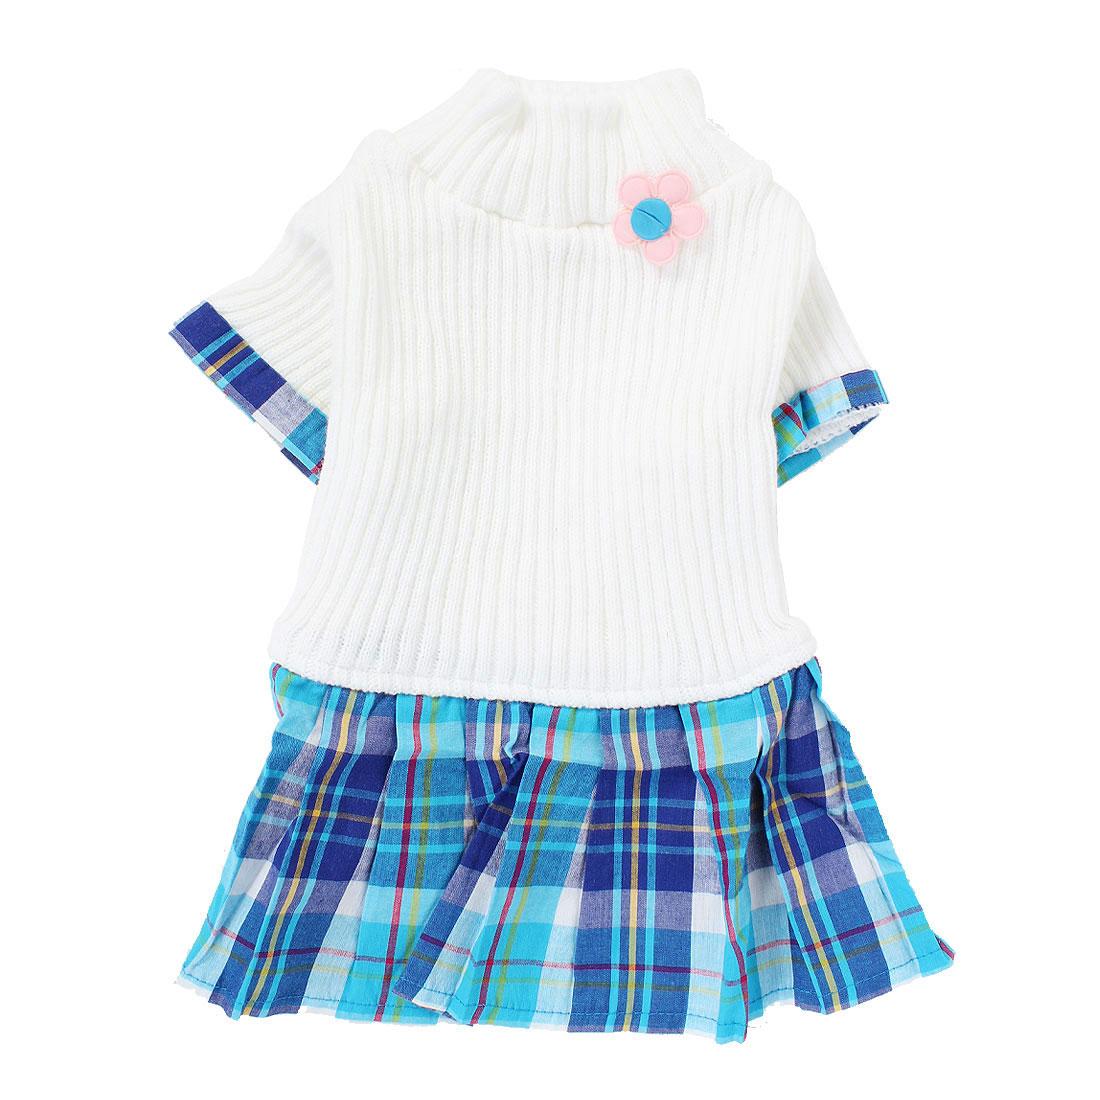 Pet Dog Warm Knitwear Sweater Plaid Pattern Dress Skirt Apparel White M